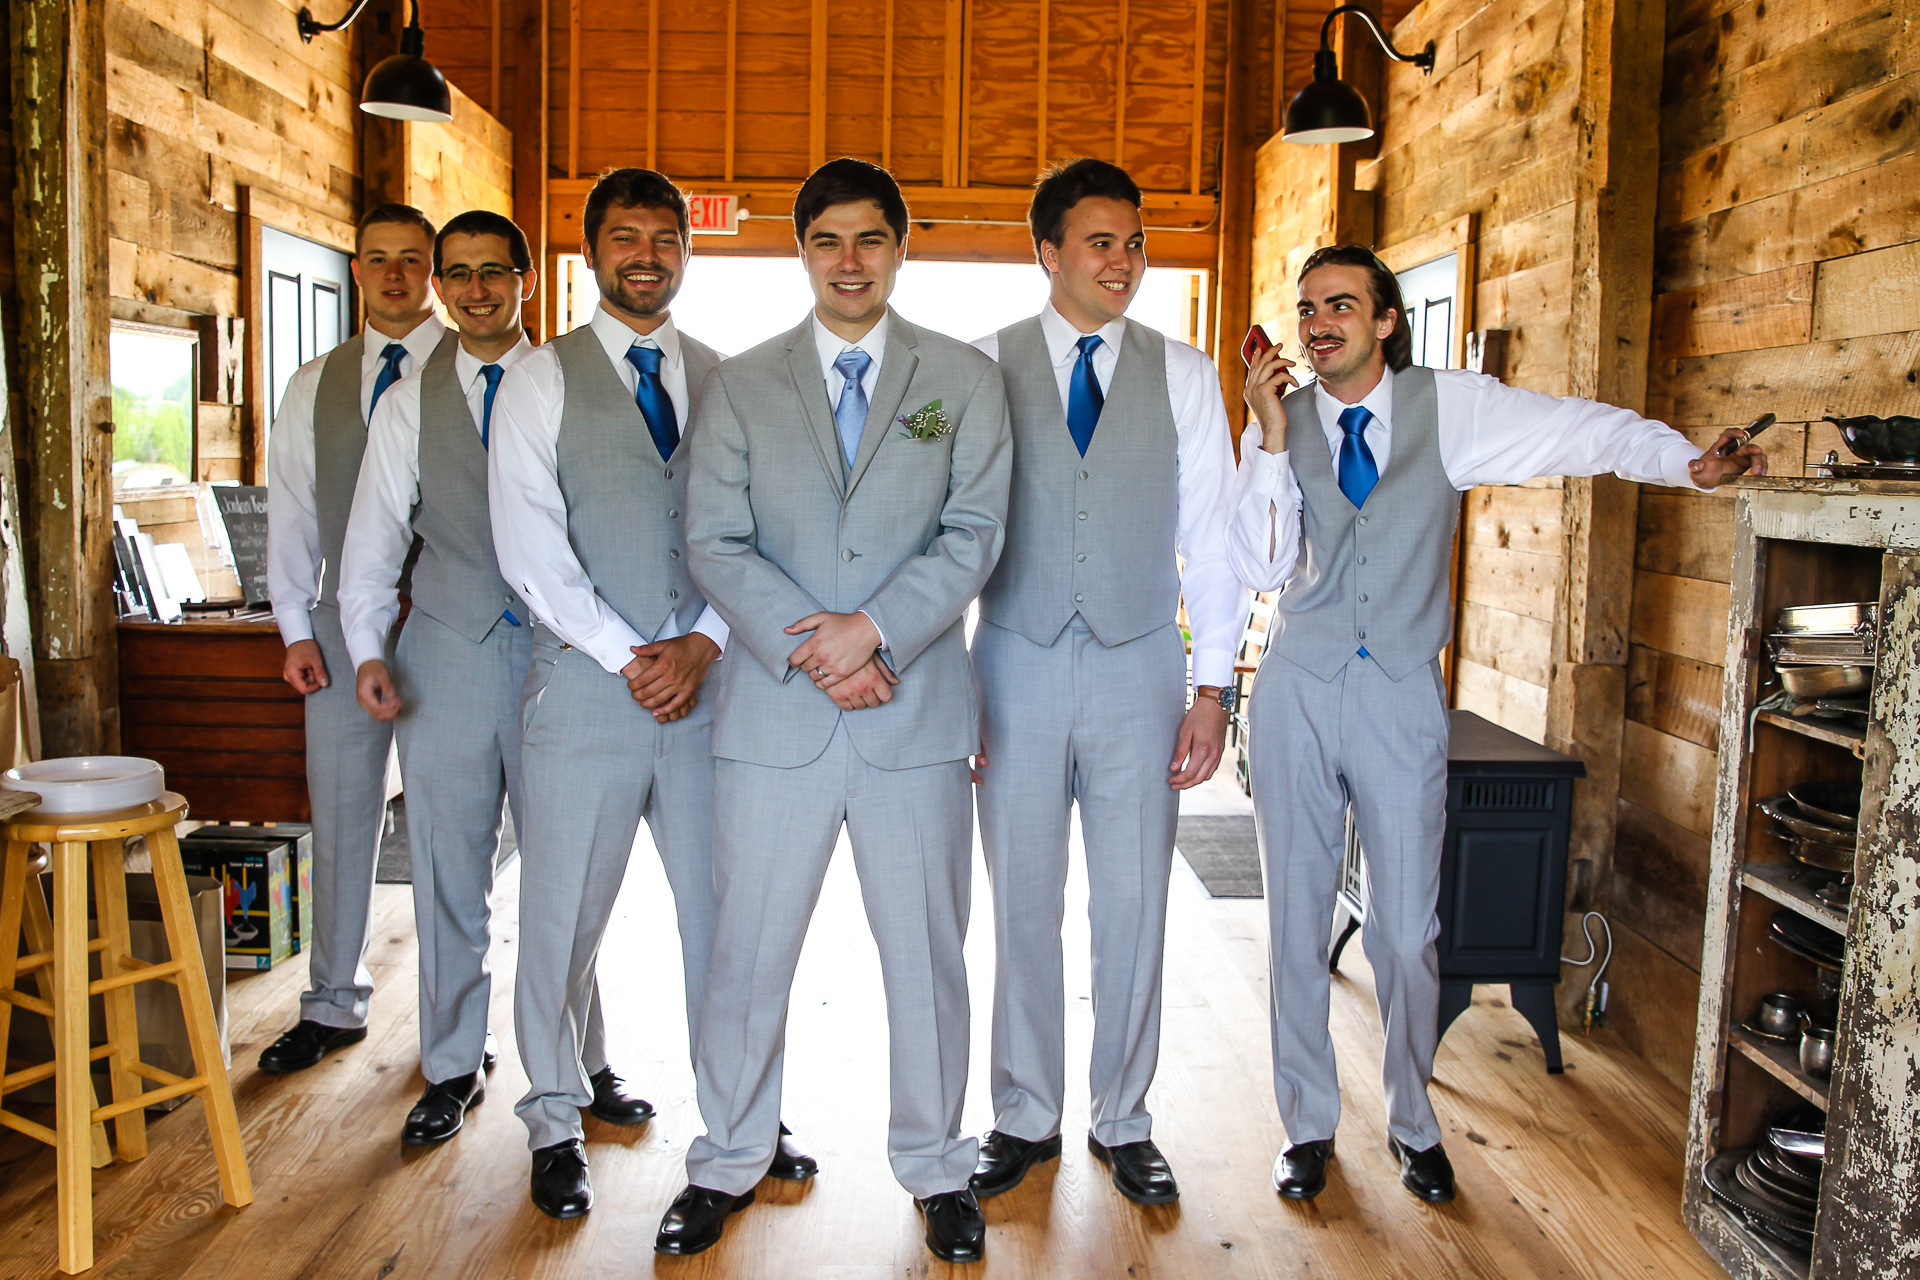 Jordan + Kevin Wedding On Sunny Slope Farm Wedding Venue by Linda Hexter Photography (1 of 30)